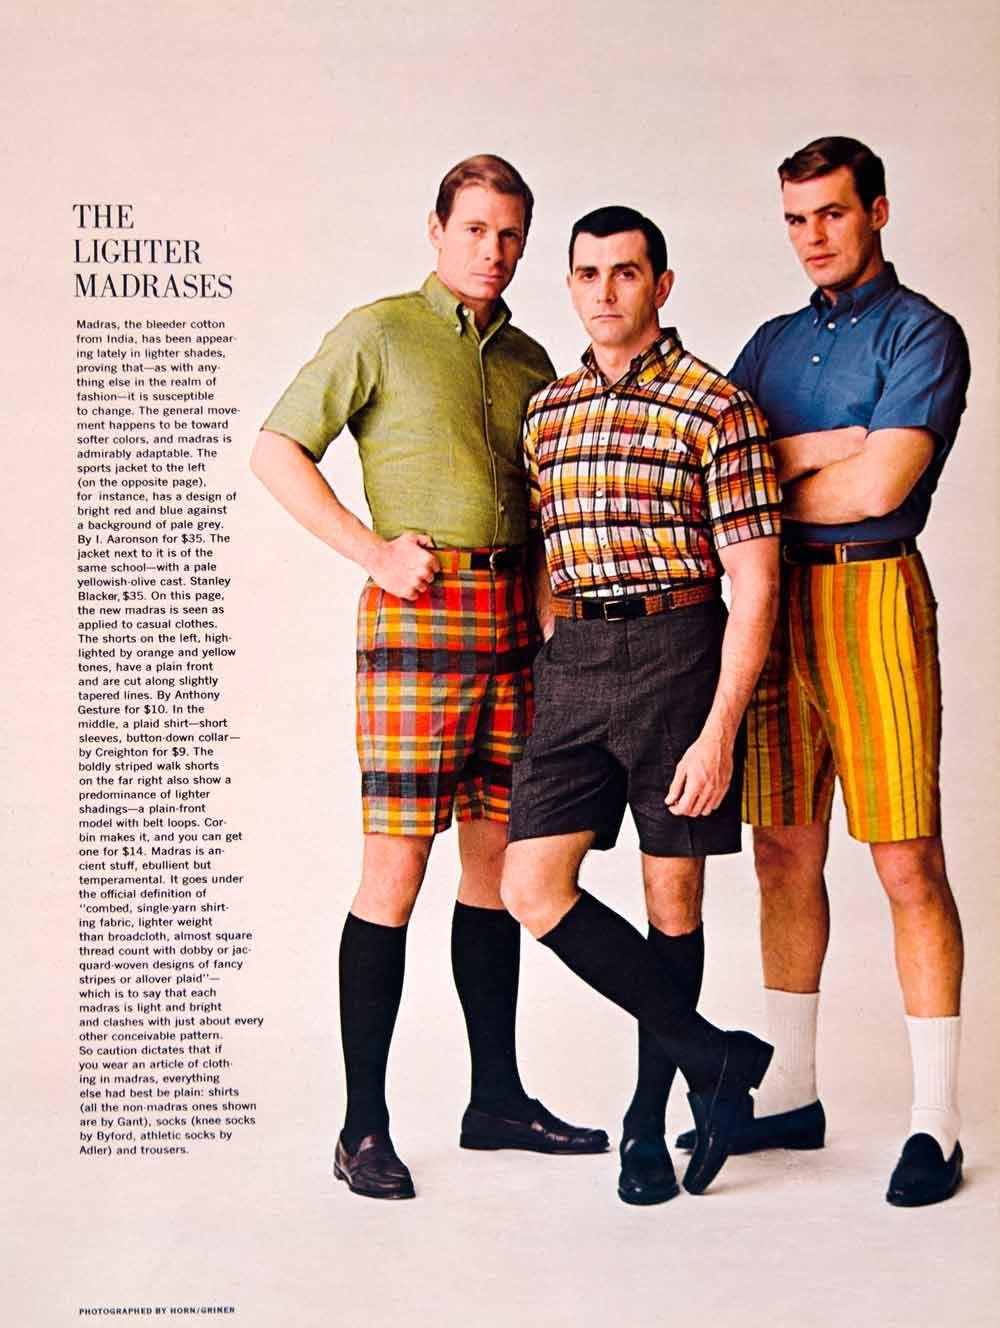 Bermuda Shorts With Knee Socks In Men S Fashion